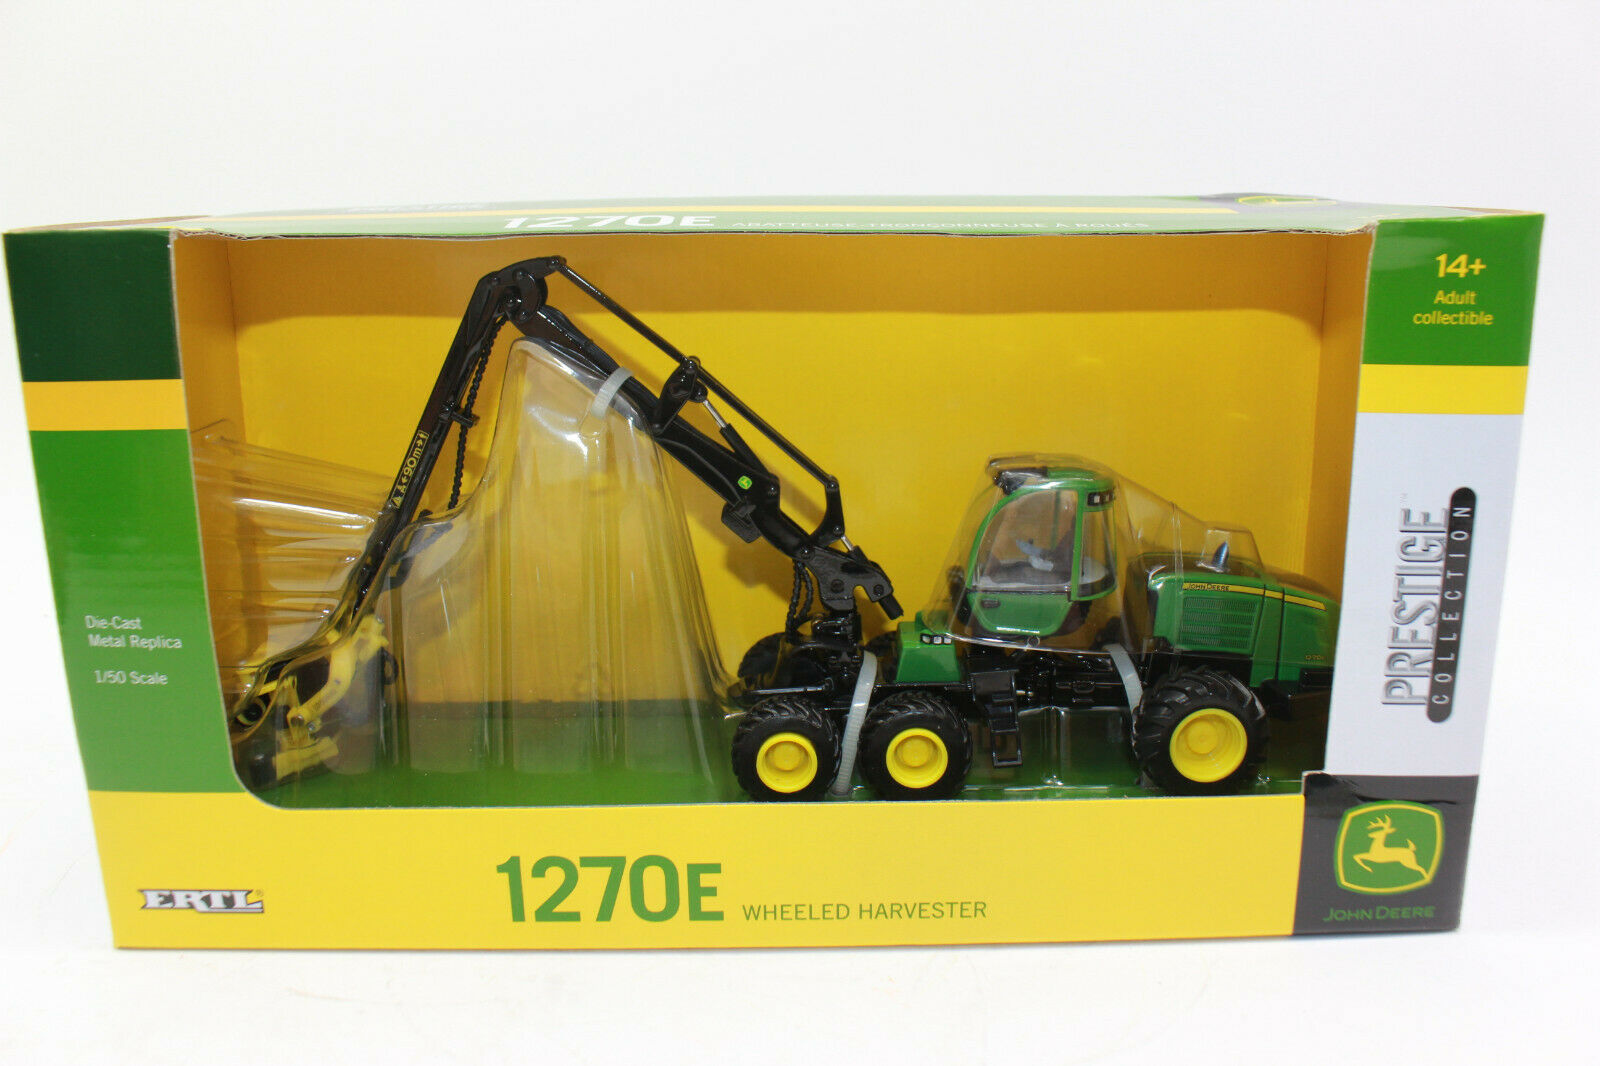 ERTL 45466 Harvester John Deere 1 50 1270E New in Original Box